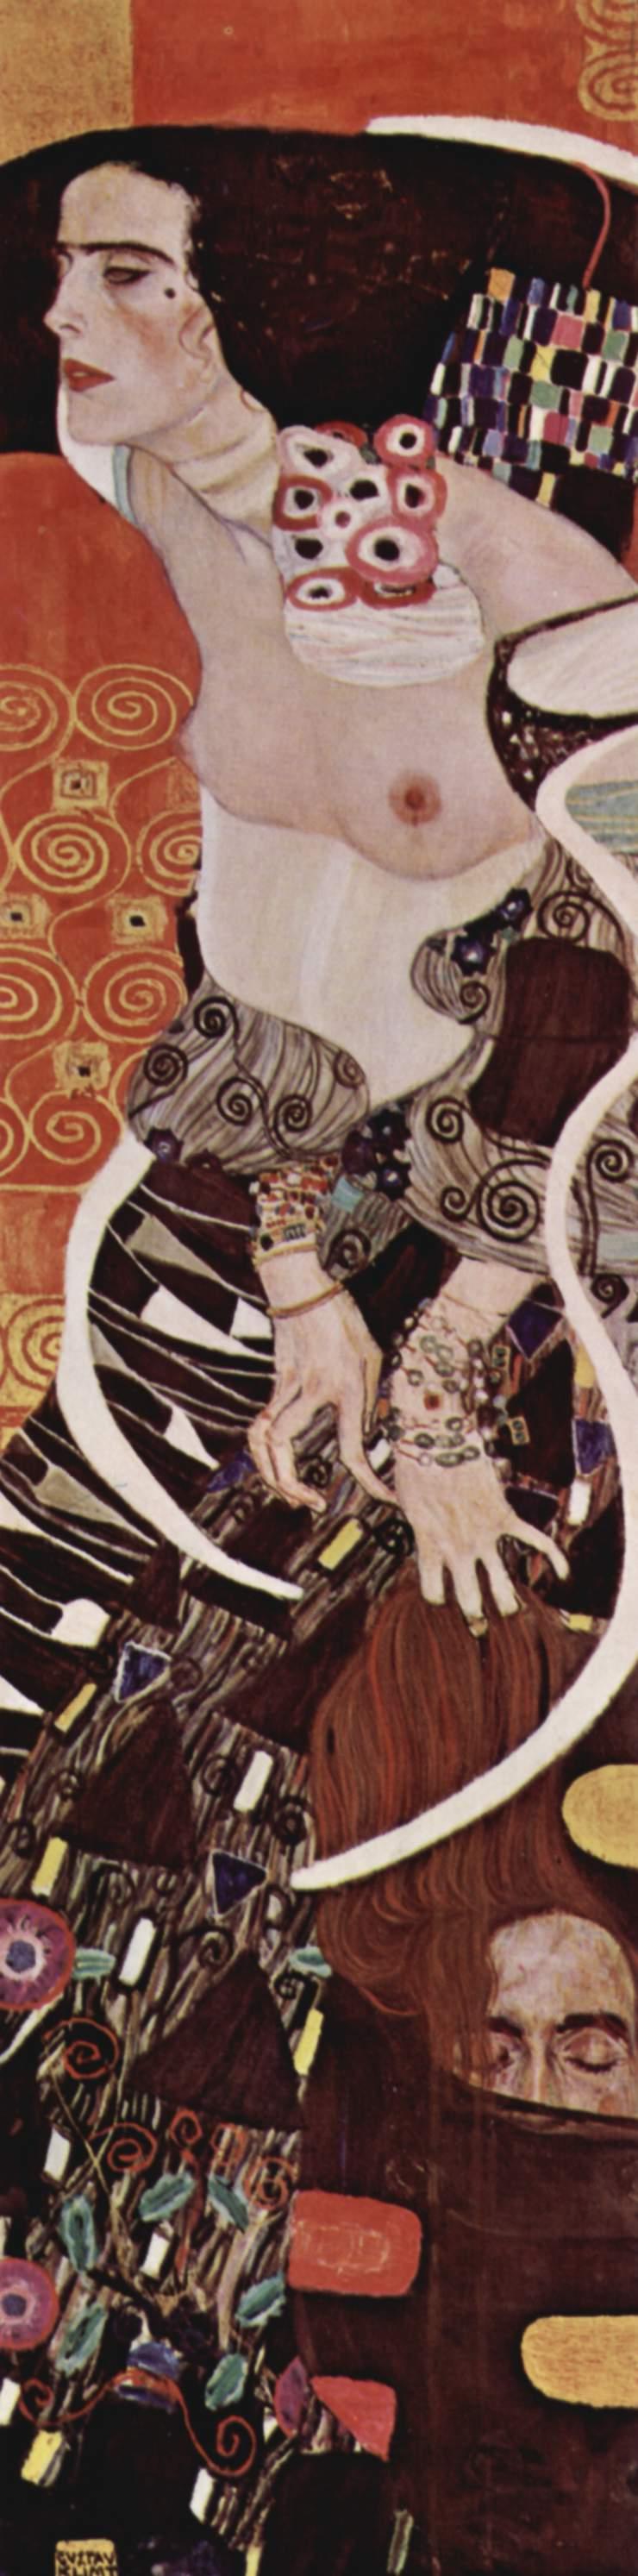 Judith II (Salome), 1909 - Gustav Klimt - WikiArt.org